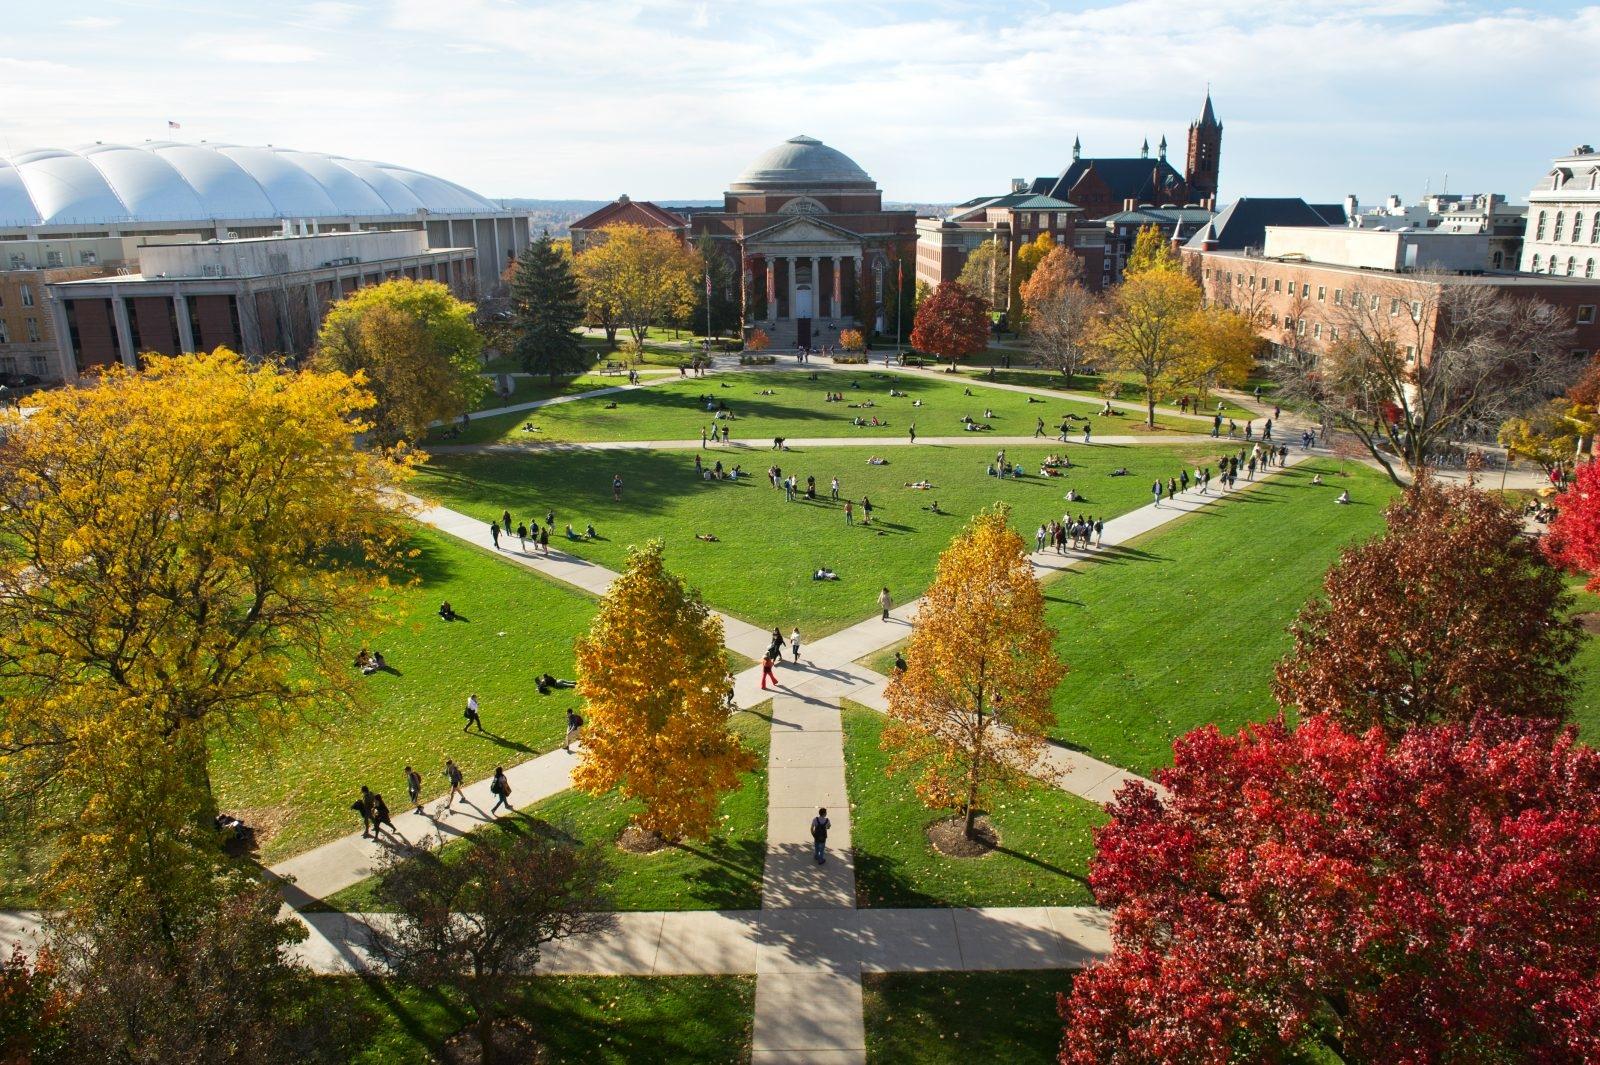 Syracuse University 雪城大學 - 在大雪紛飛的國度裡,點亮熾熱的橙色